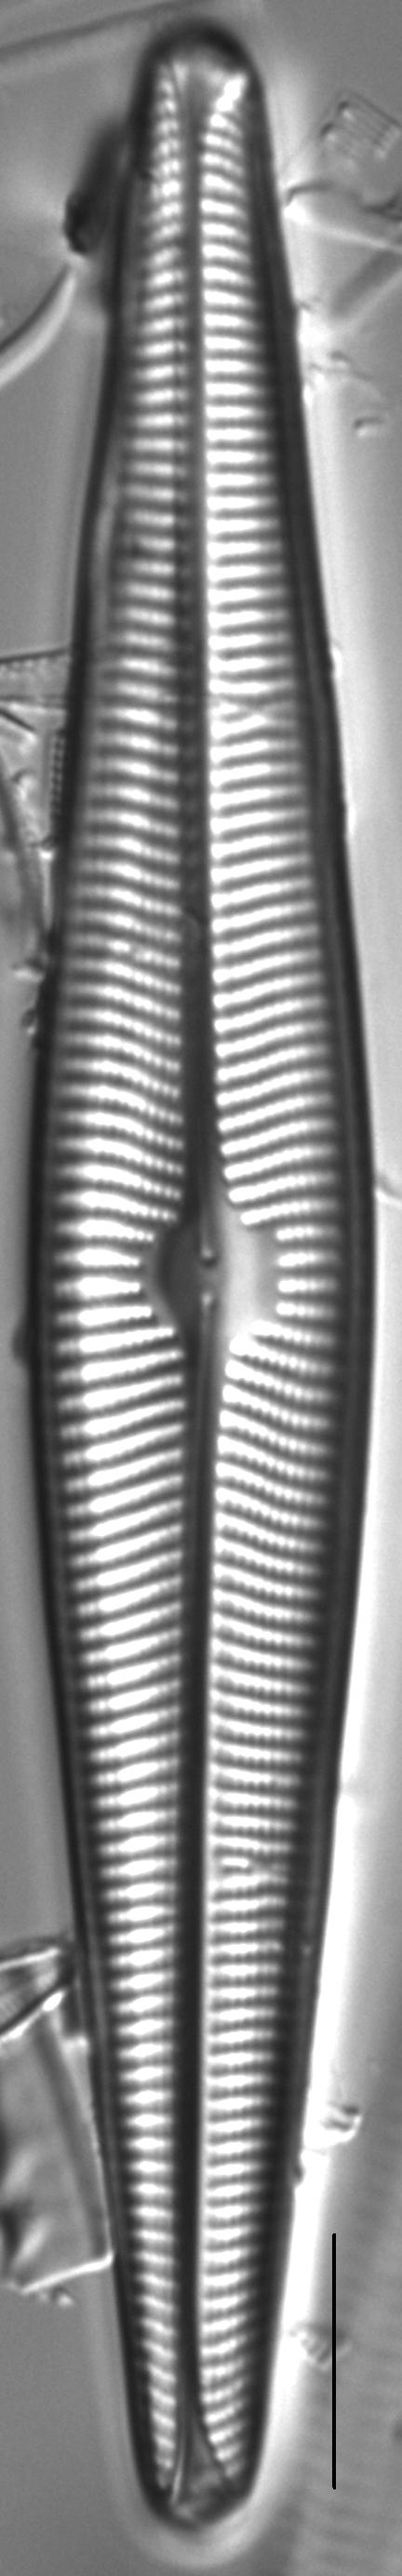 Navicula galloae LM4